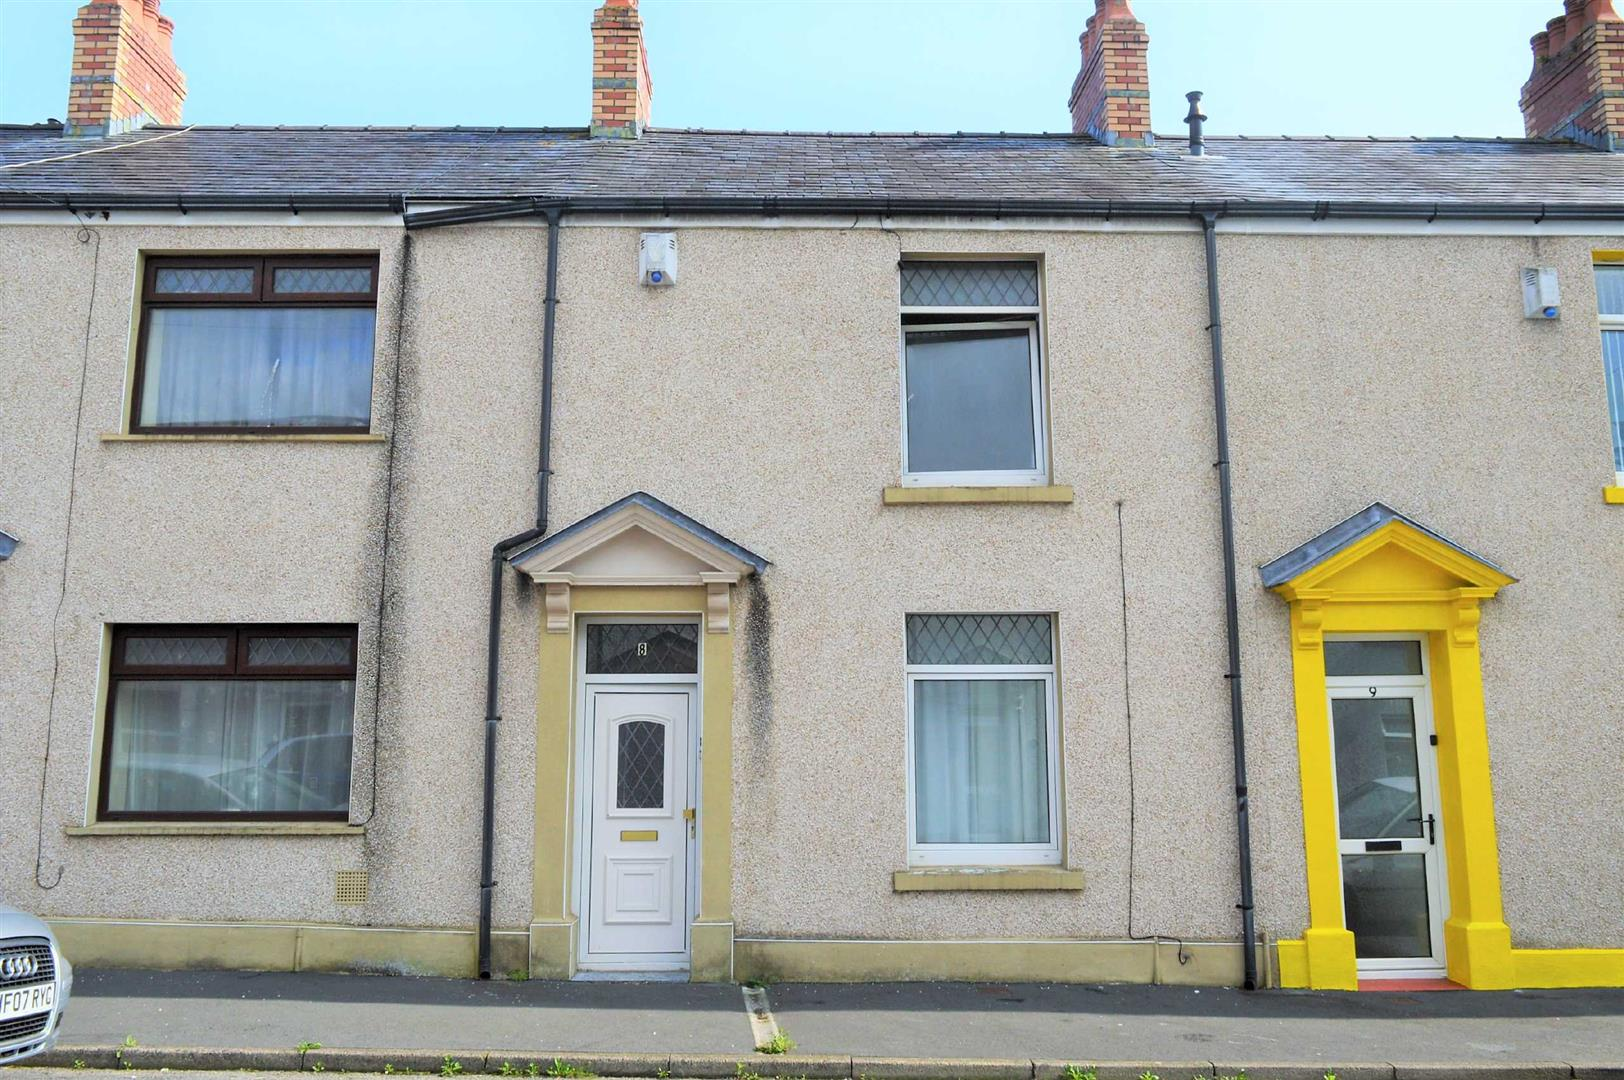 Hafod Street, Hafod, Swansea, SA1 2HA